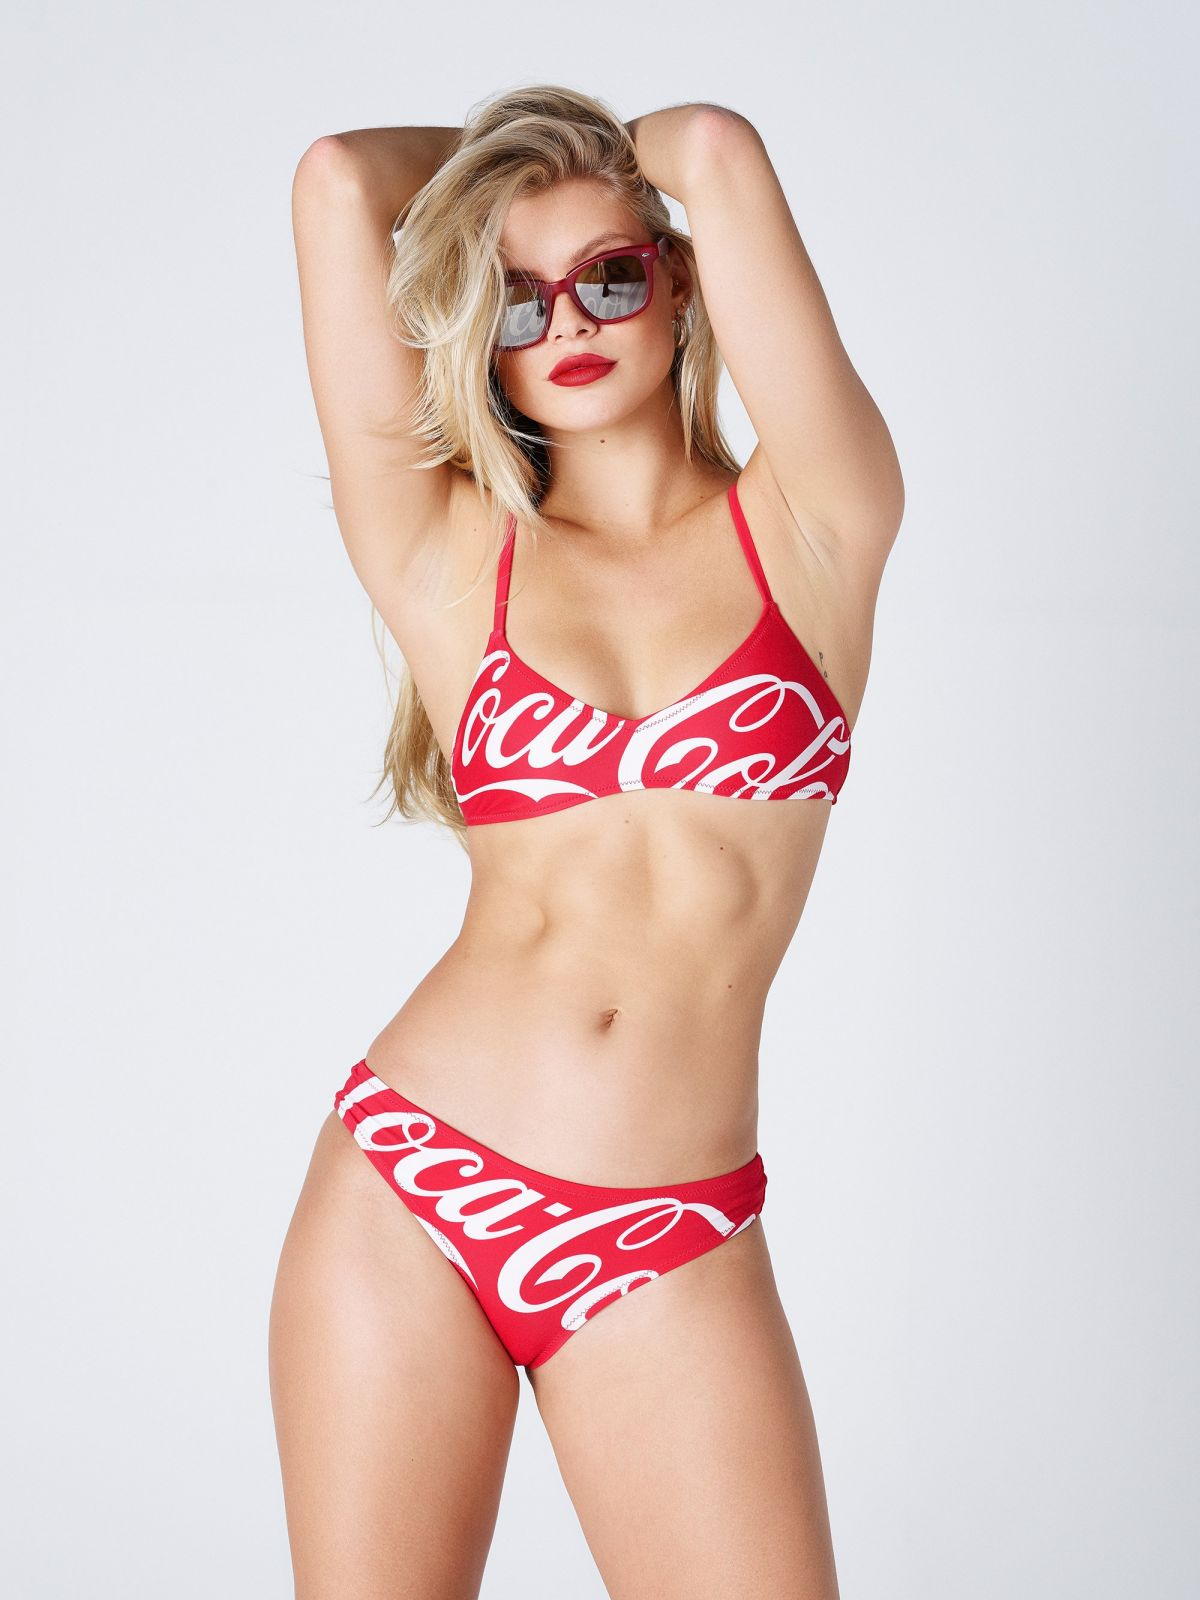 Josie Canseco 2019 : Josie Canseco – Kith x Coca Cola 2019 photoshoot-06